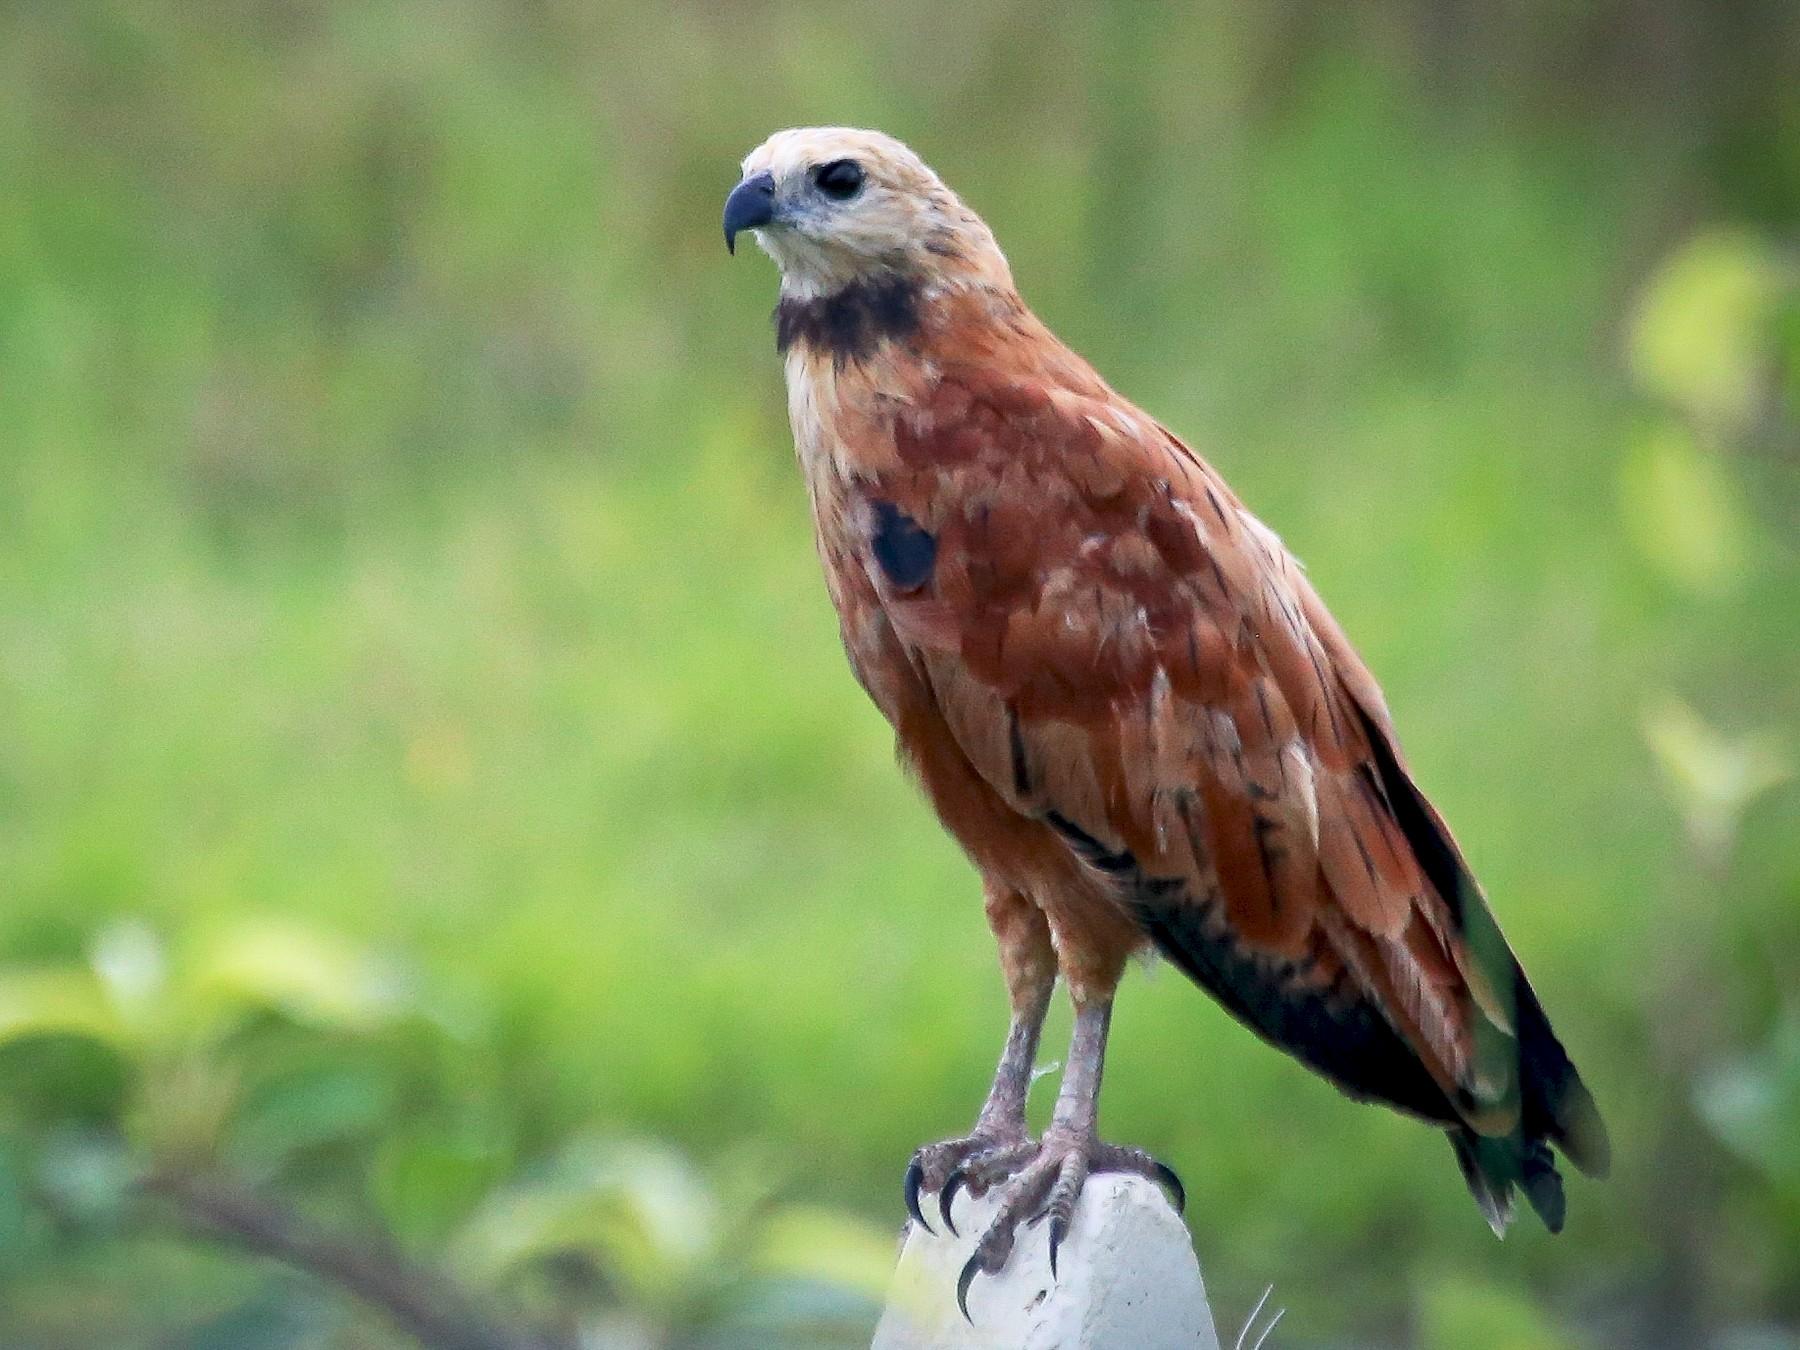 Black-collared Hawk - Chantelle du Plessis (Andes EcoTours)